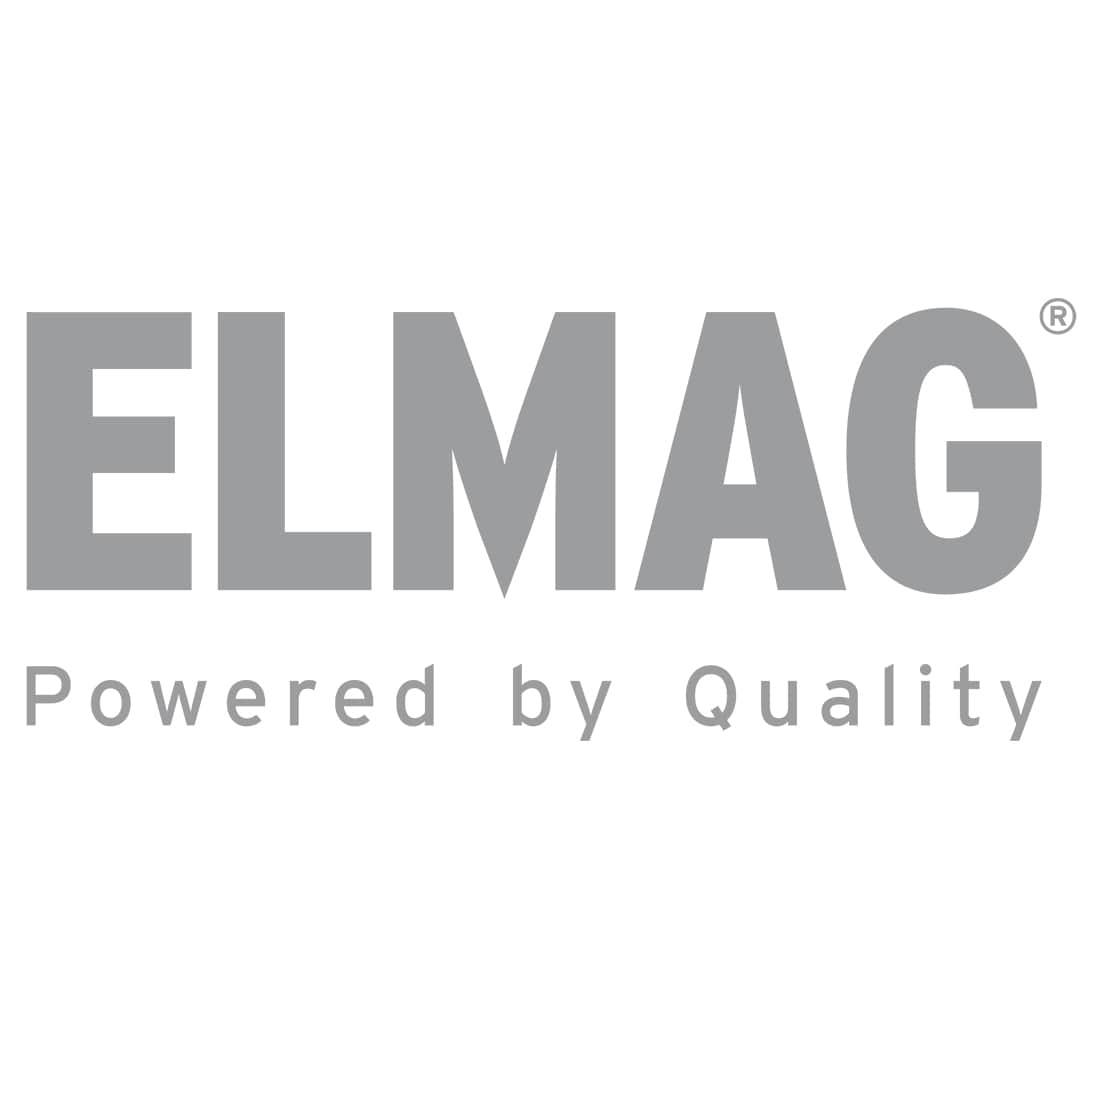 Nadelhalter für 49 Stk. 3mm Nadeln